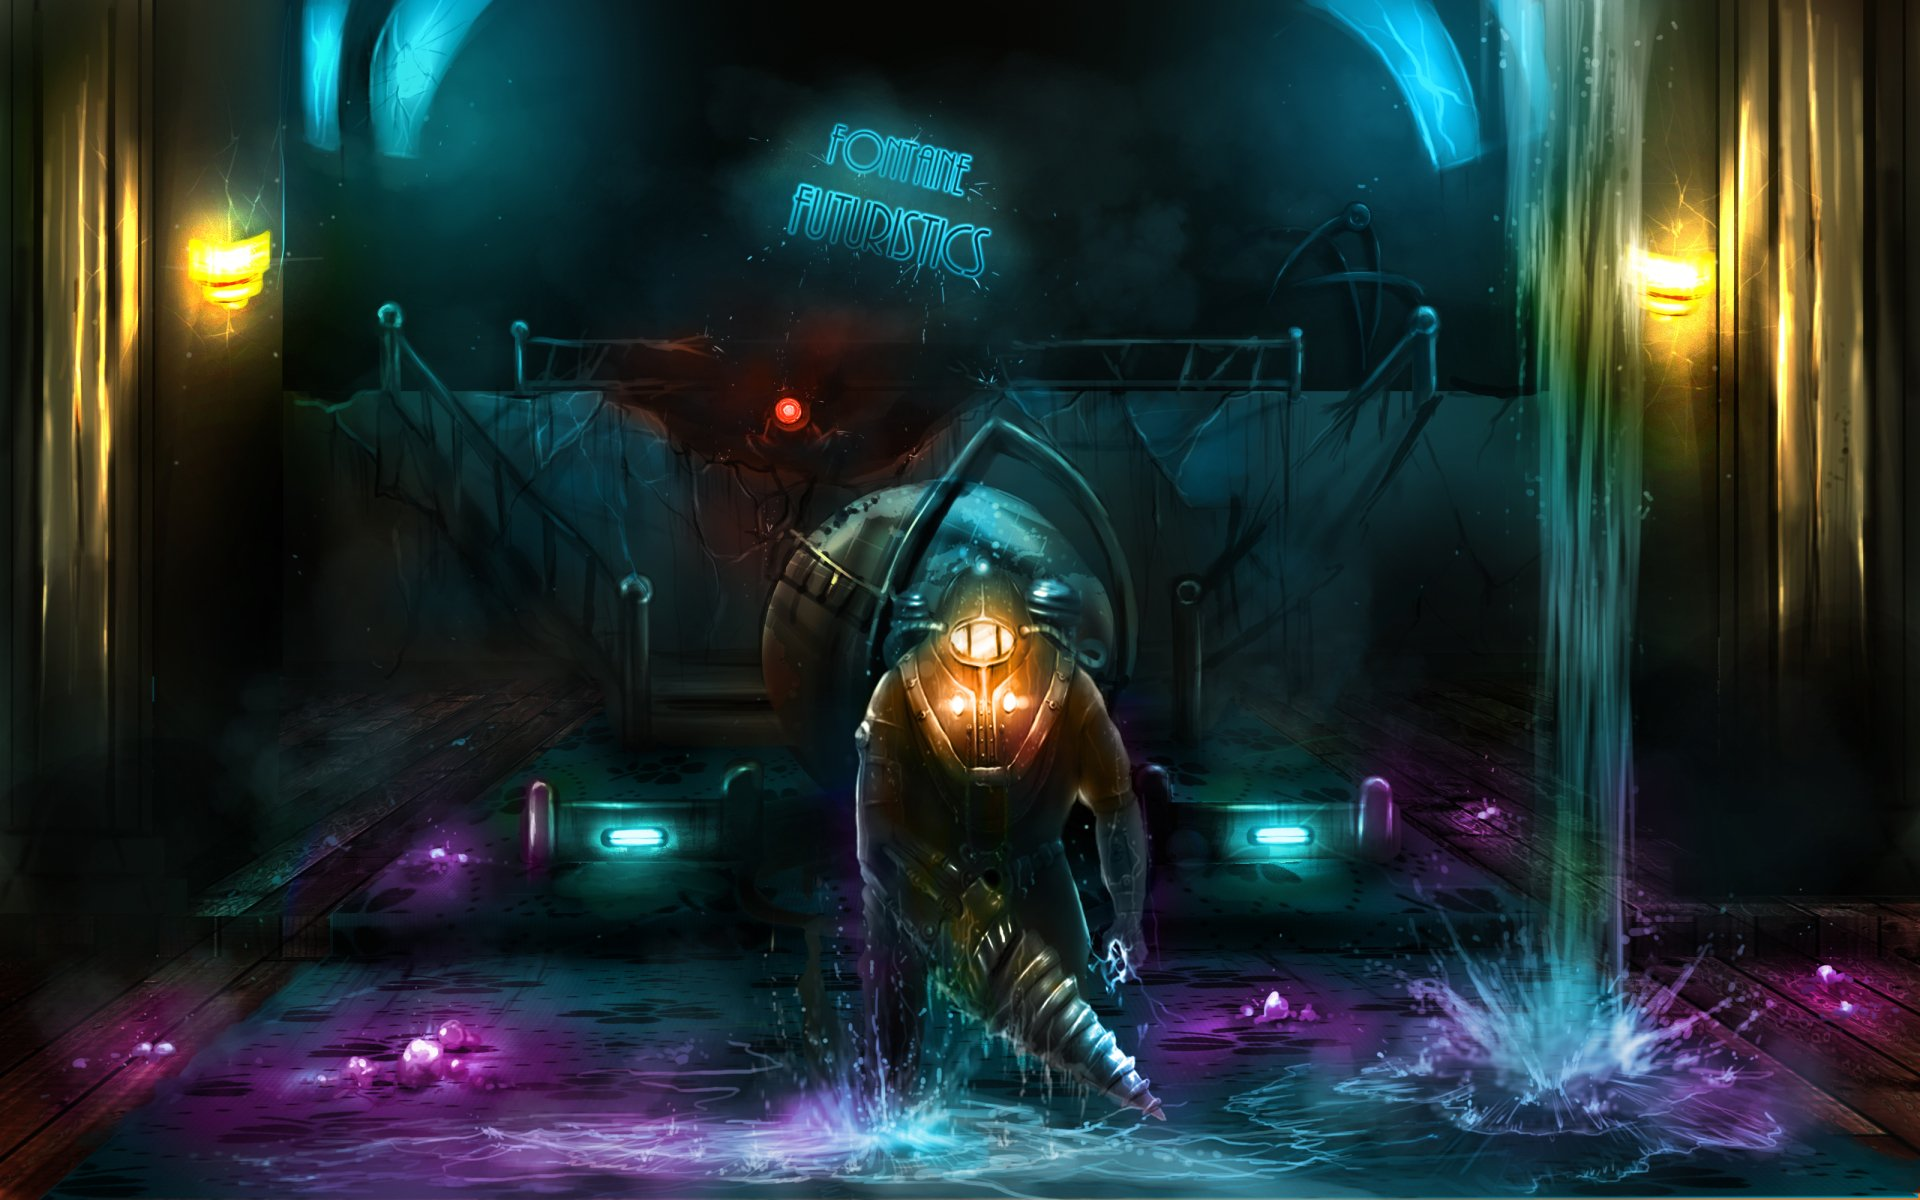 Video Game - Bioshock 2  Bioshock Video Game Wallpaper